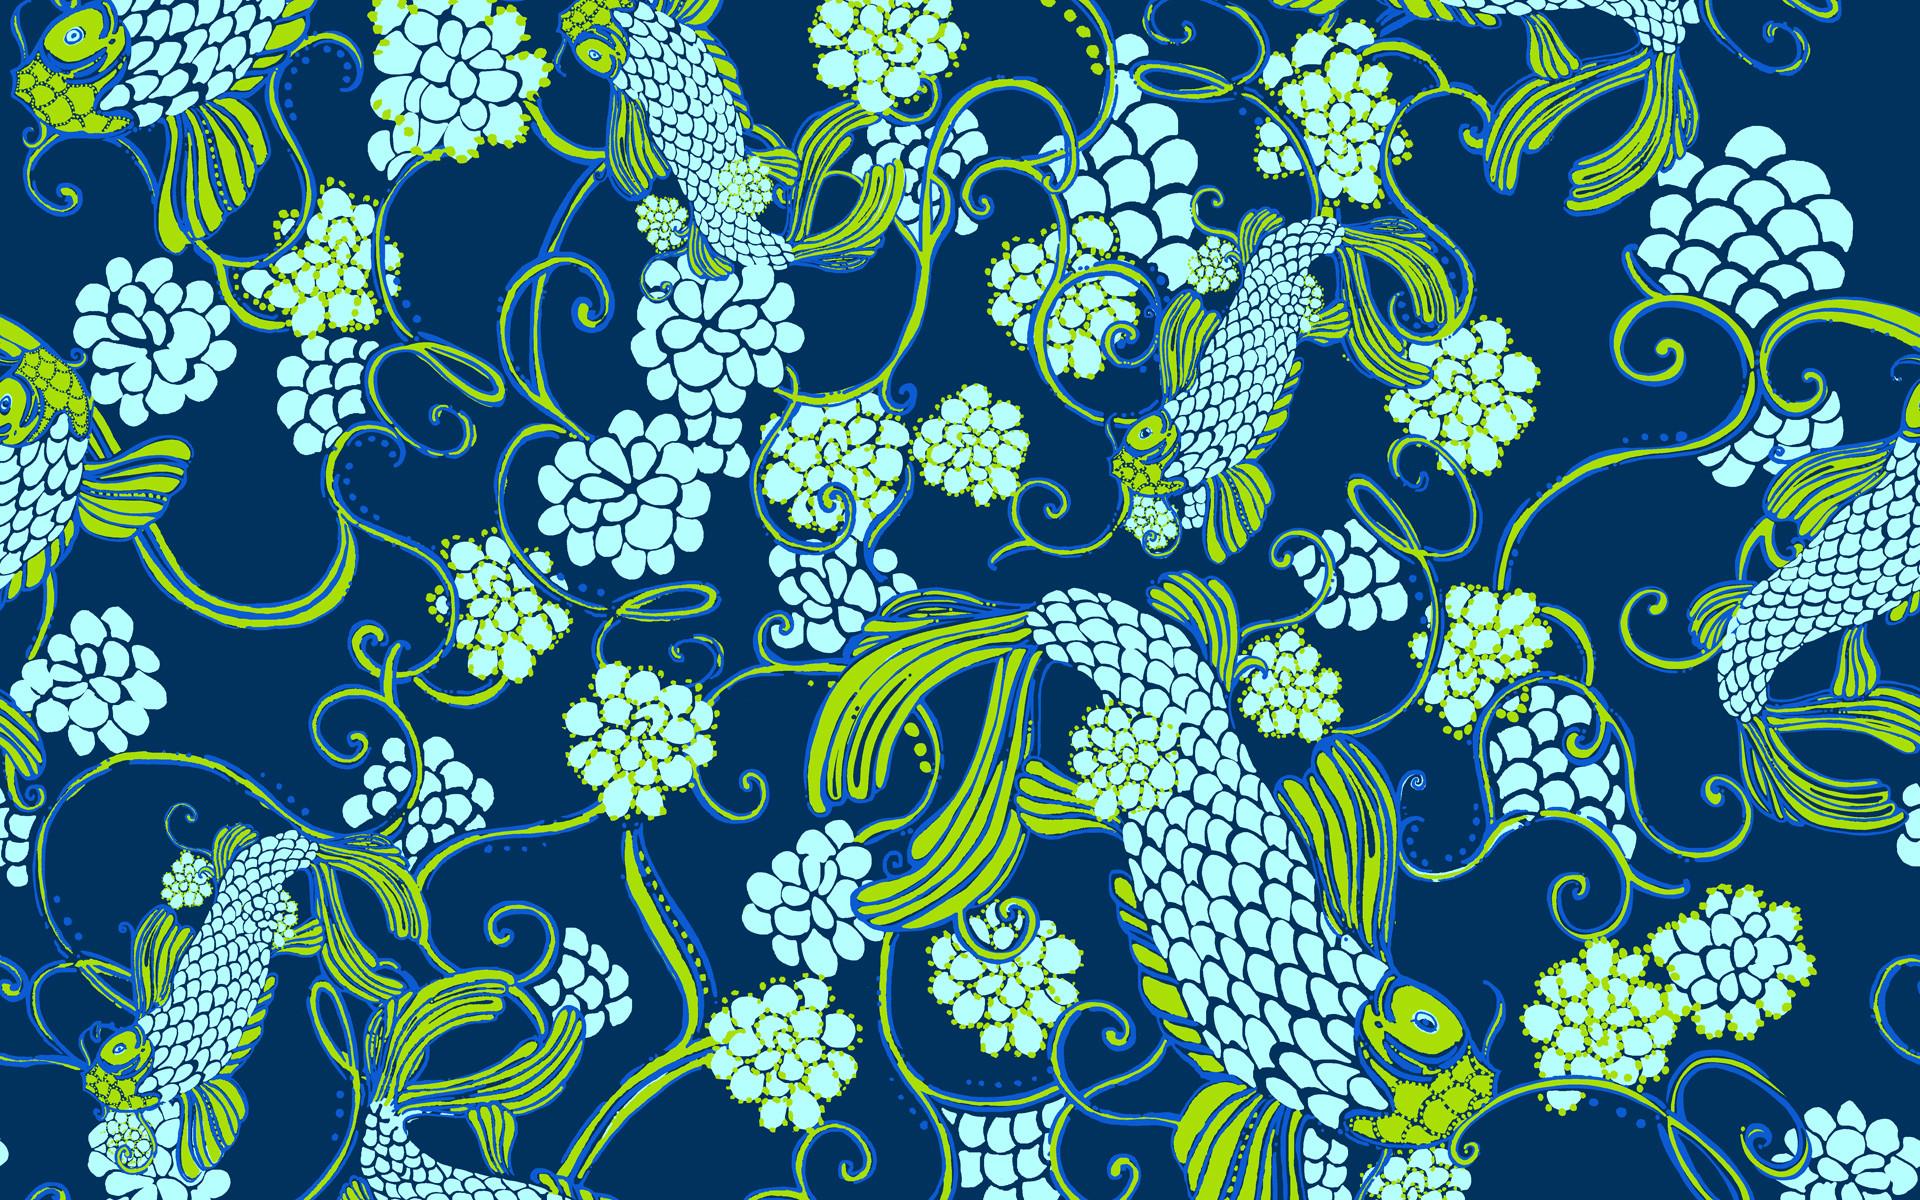 Lilly Desktop Wallpaper from